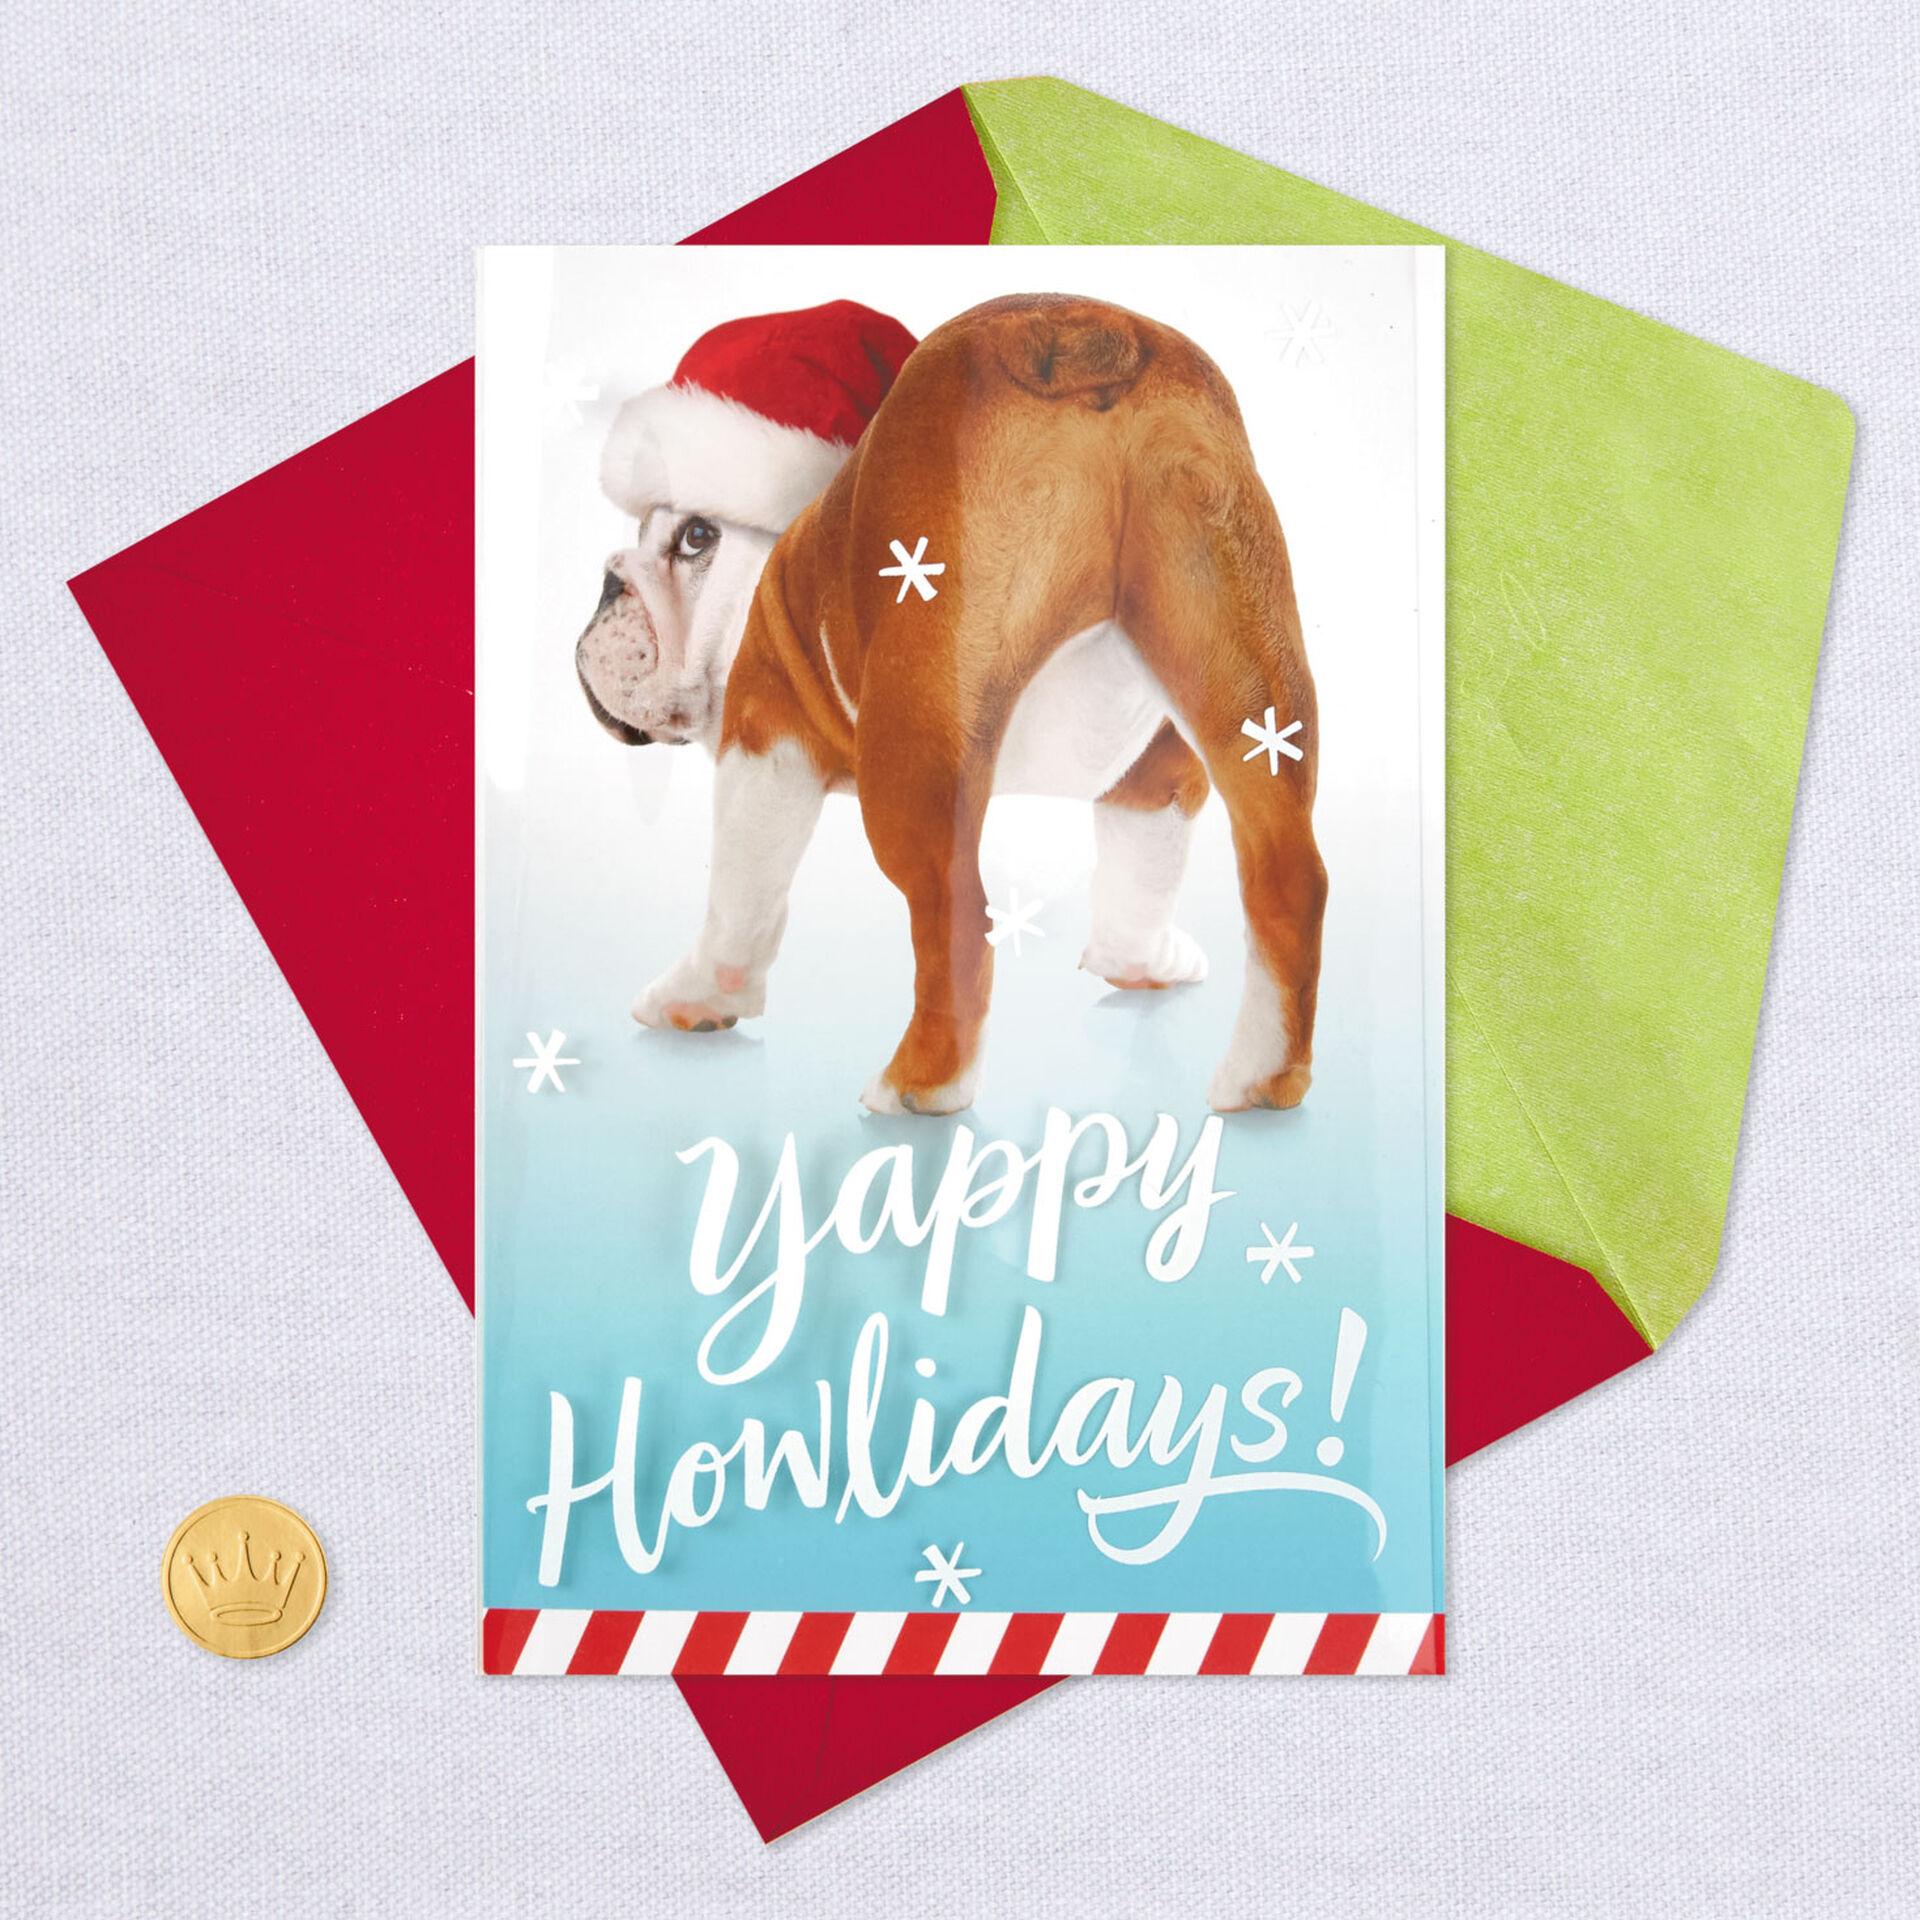 Yappy Howlidays Butt S Up Dog Funny Christmas Card Greeting Cards Hallmark